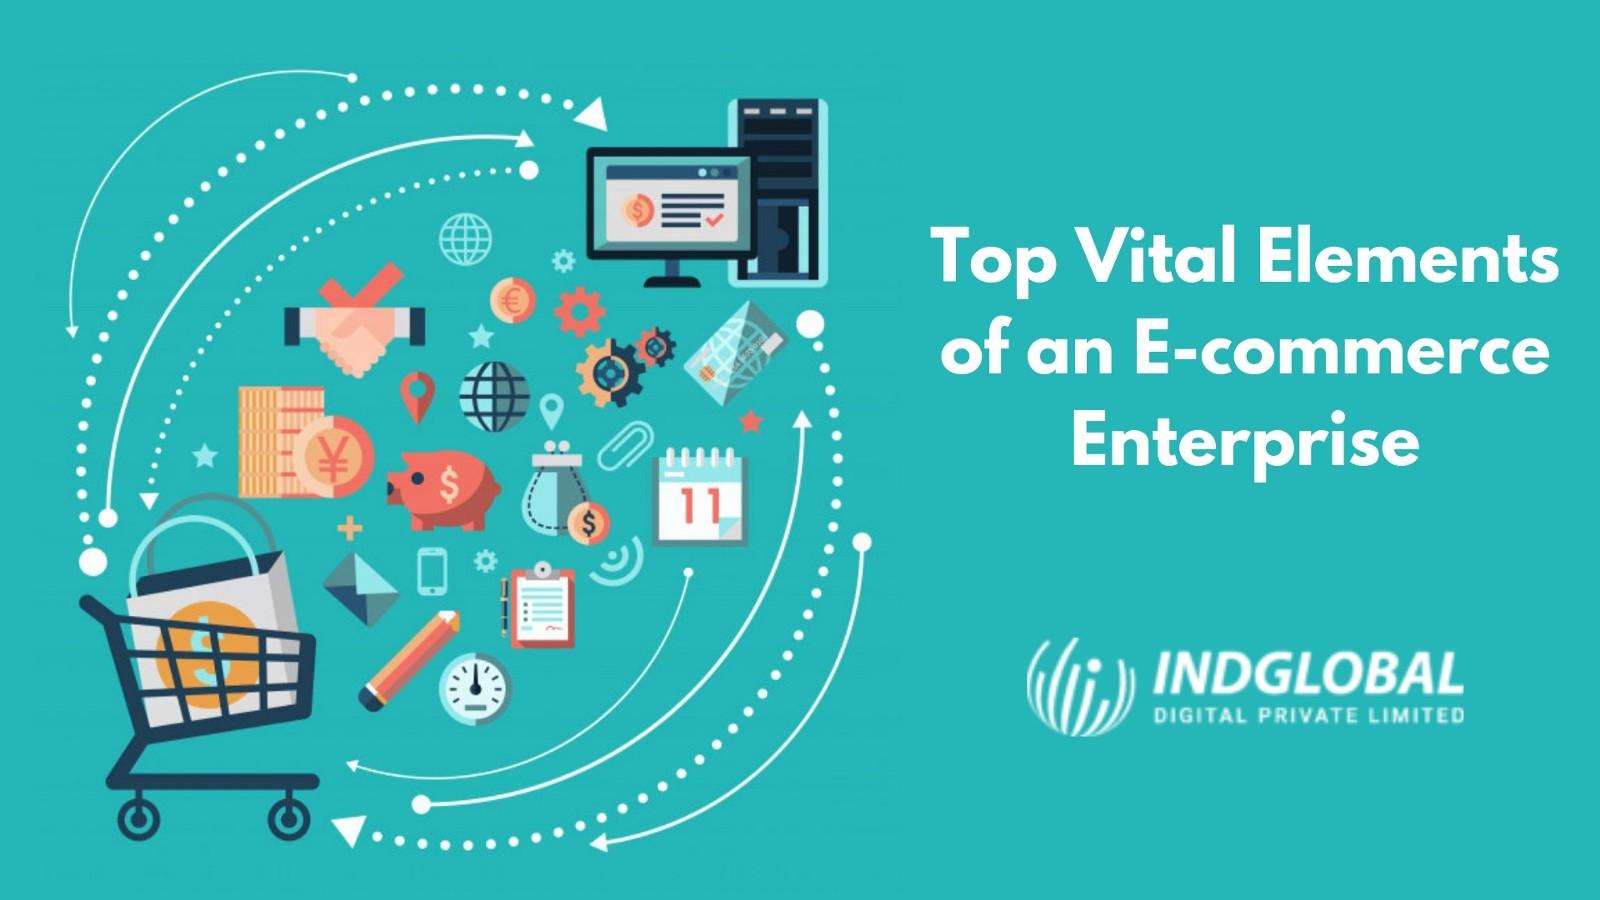 Top Vital Elements of an E-commerce Enterprise – Indglobal